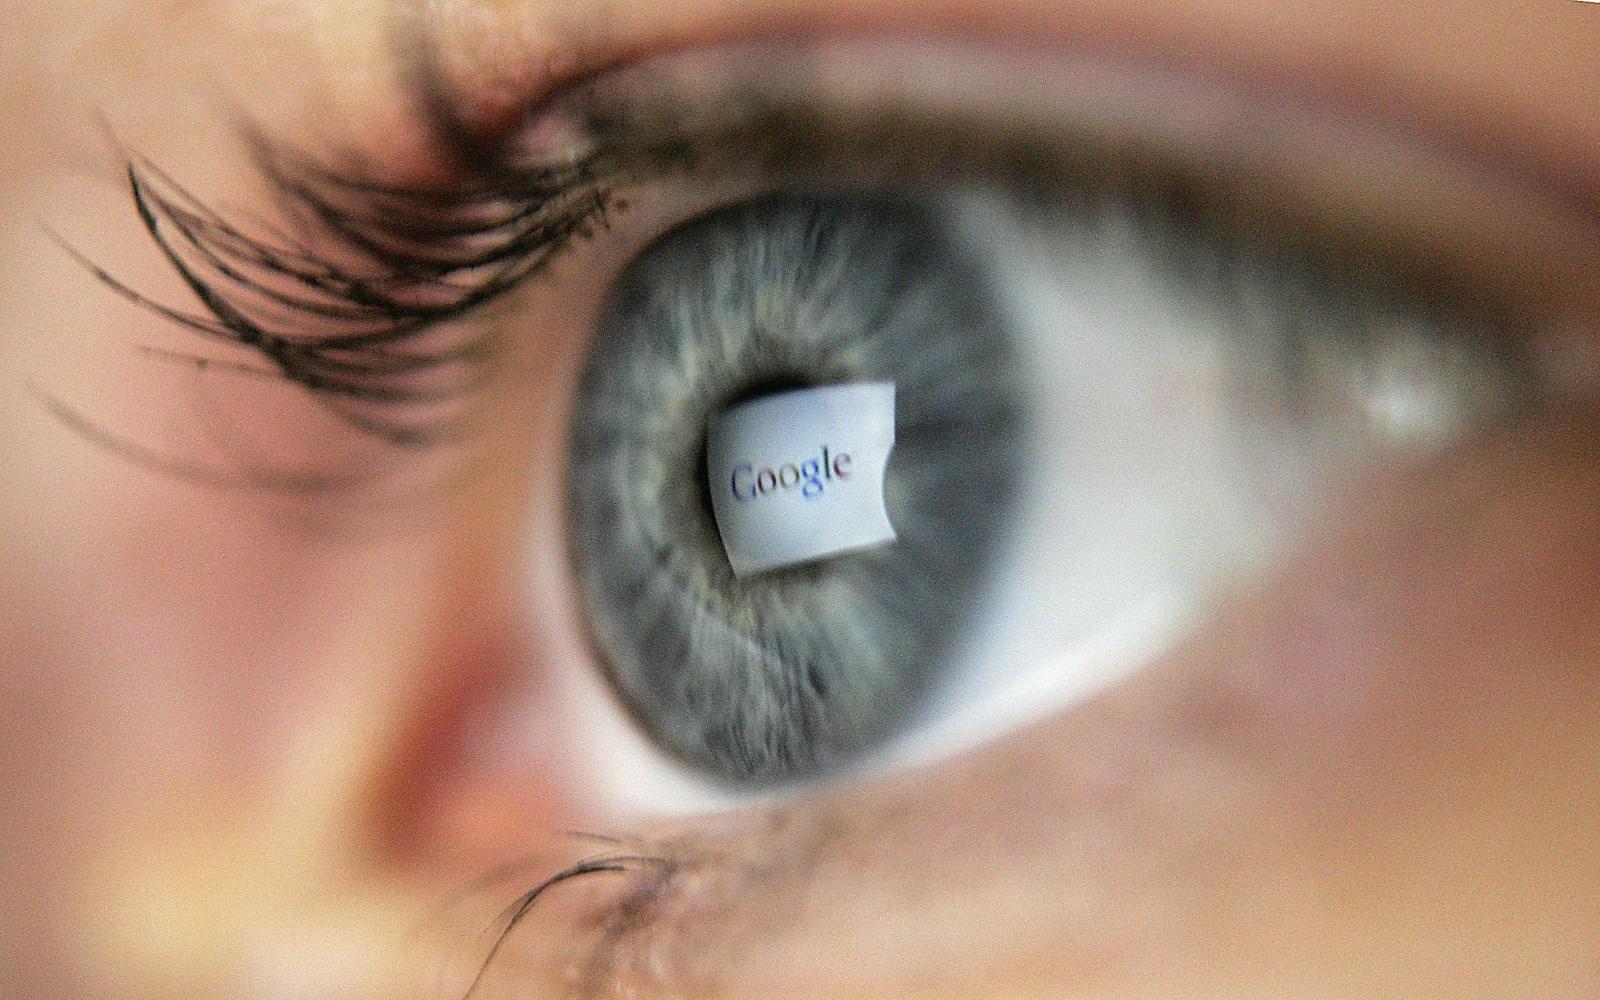 Google eyeball